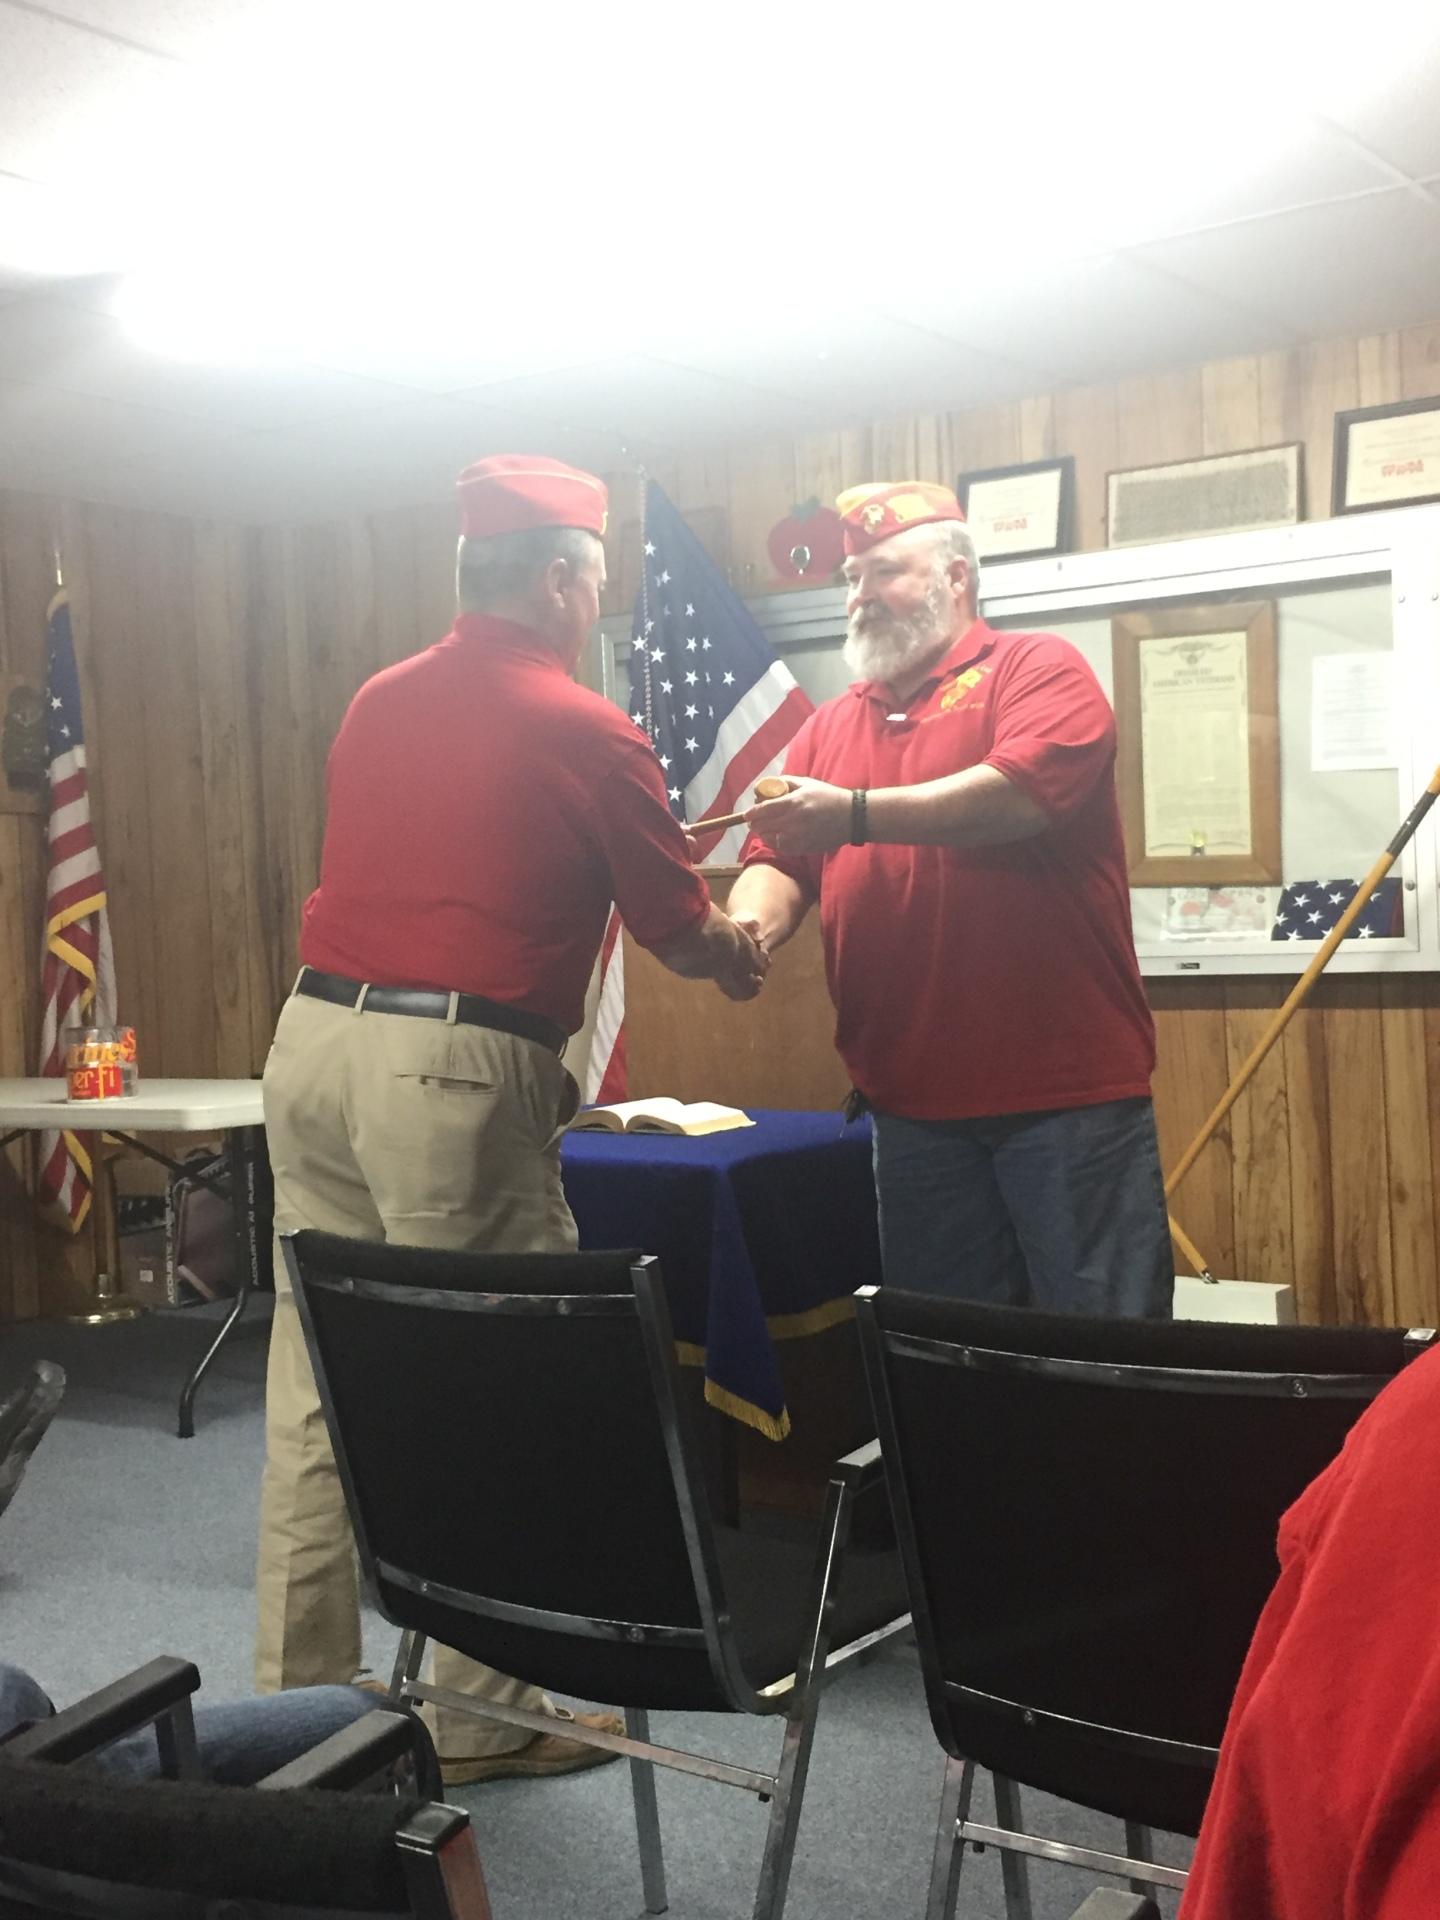 Lt-Rt; Kevin Gratehouse, Chuck Bones